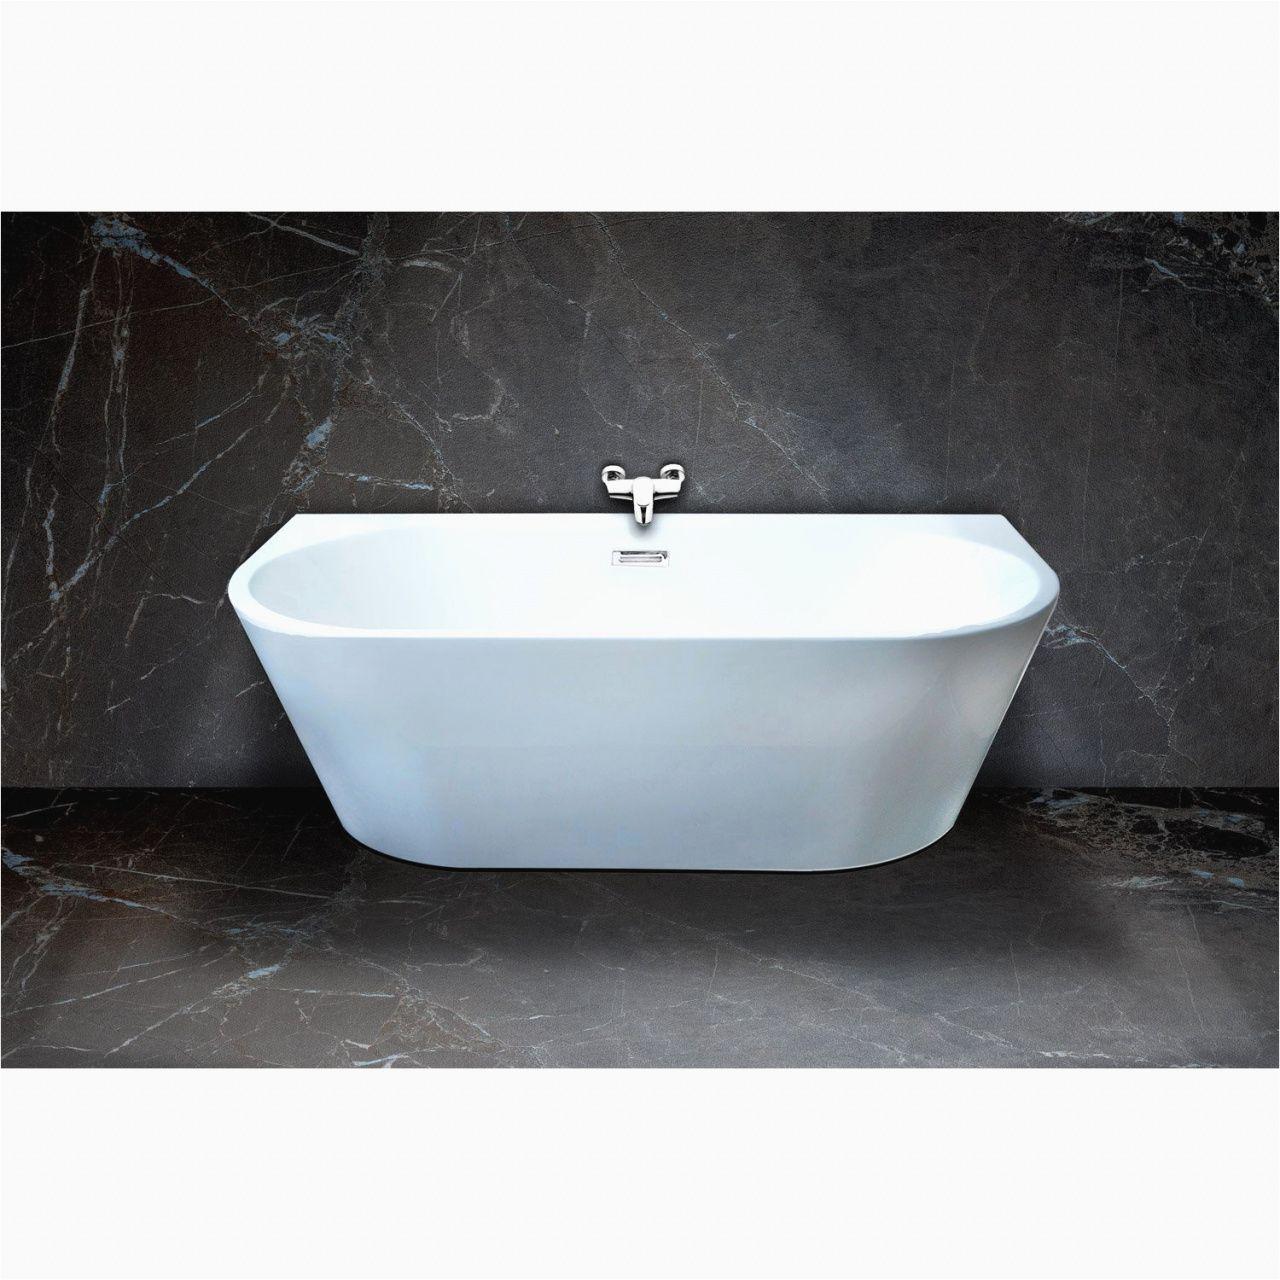 20 Baignoire Sur Pied Leroy Merlin (With Images) | Bathroom ... tout Baignoire Leroy Merlin